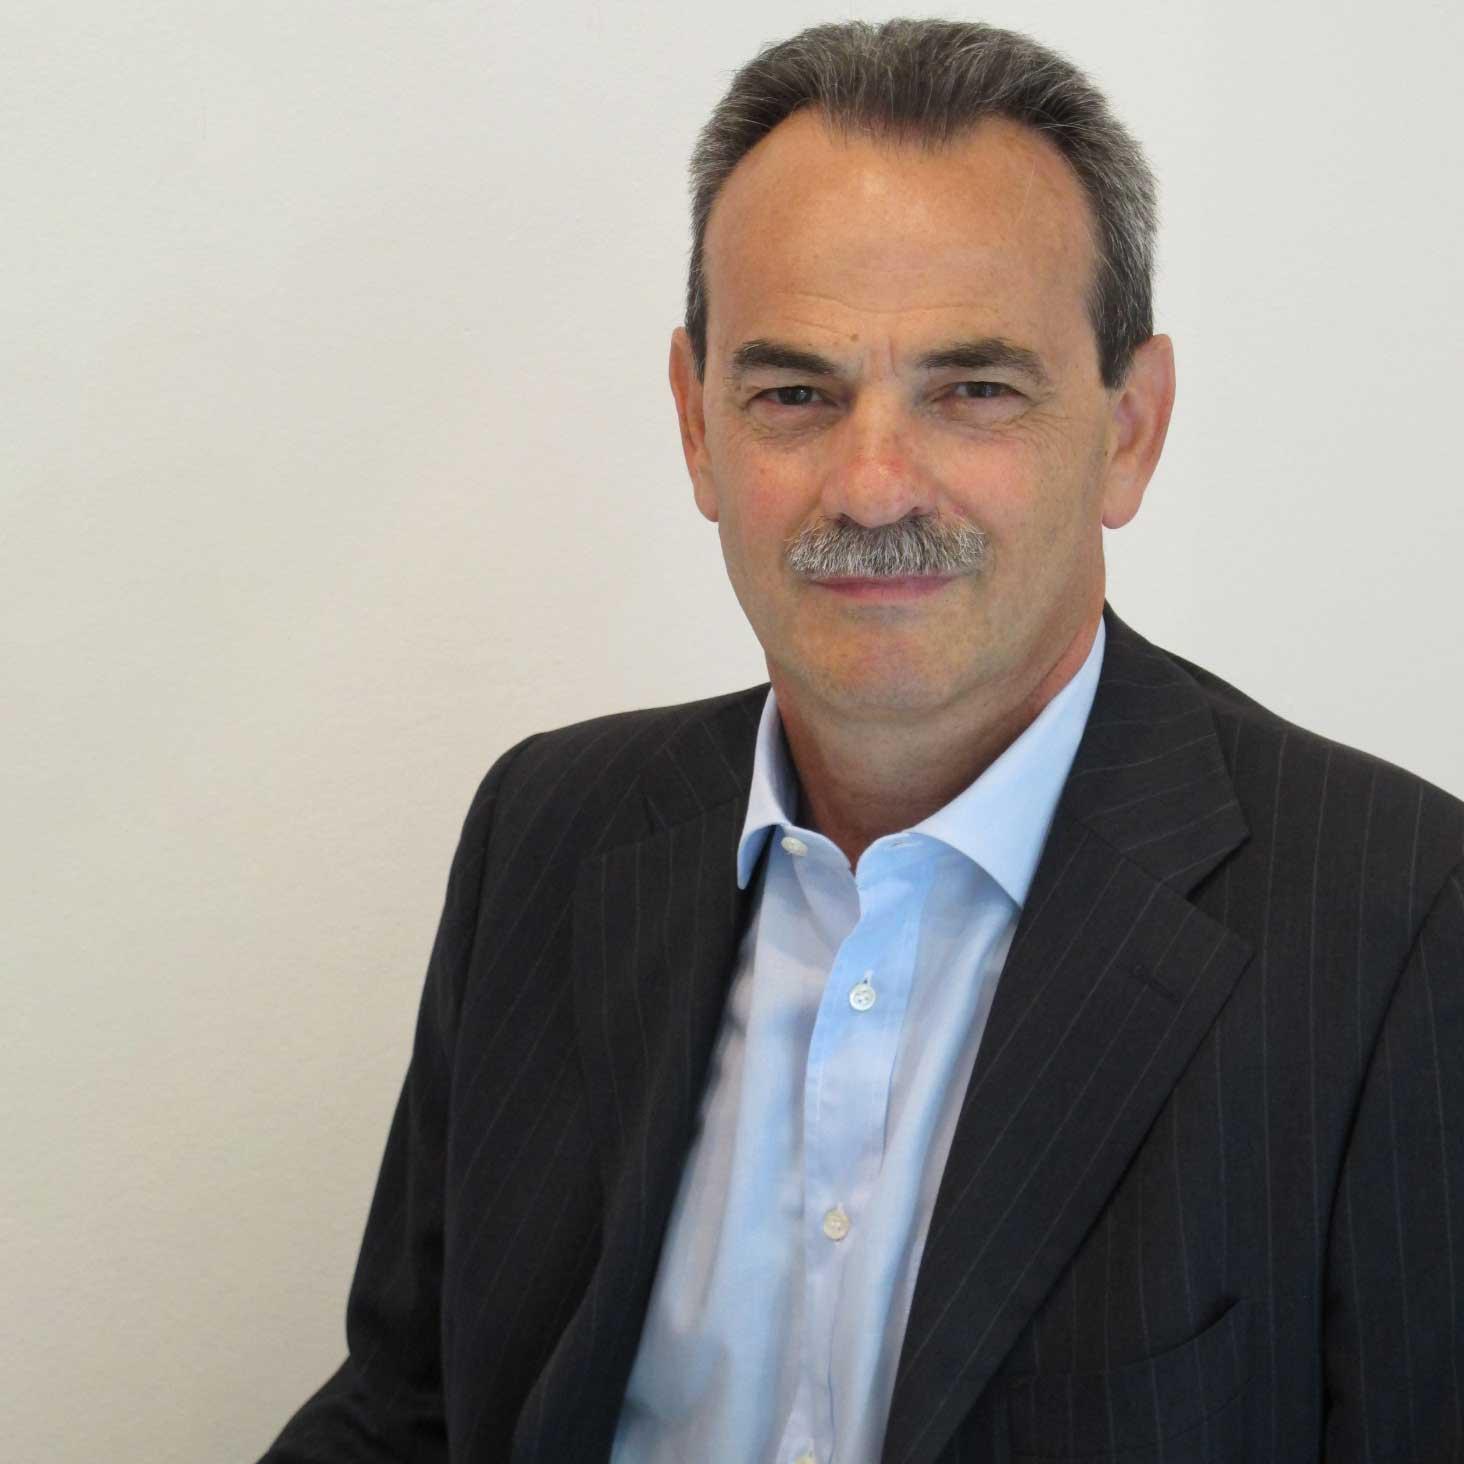 Armando Pintus, Psicologo, Psicoterapeuta e Coach a Milano e online